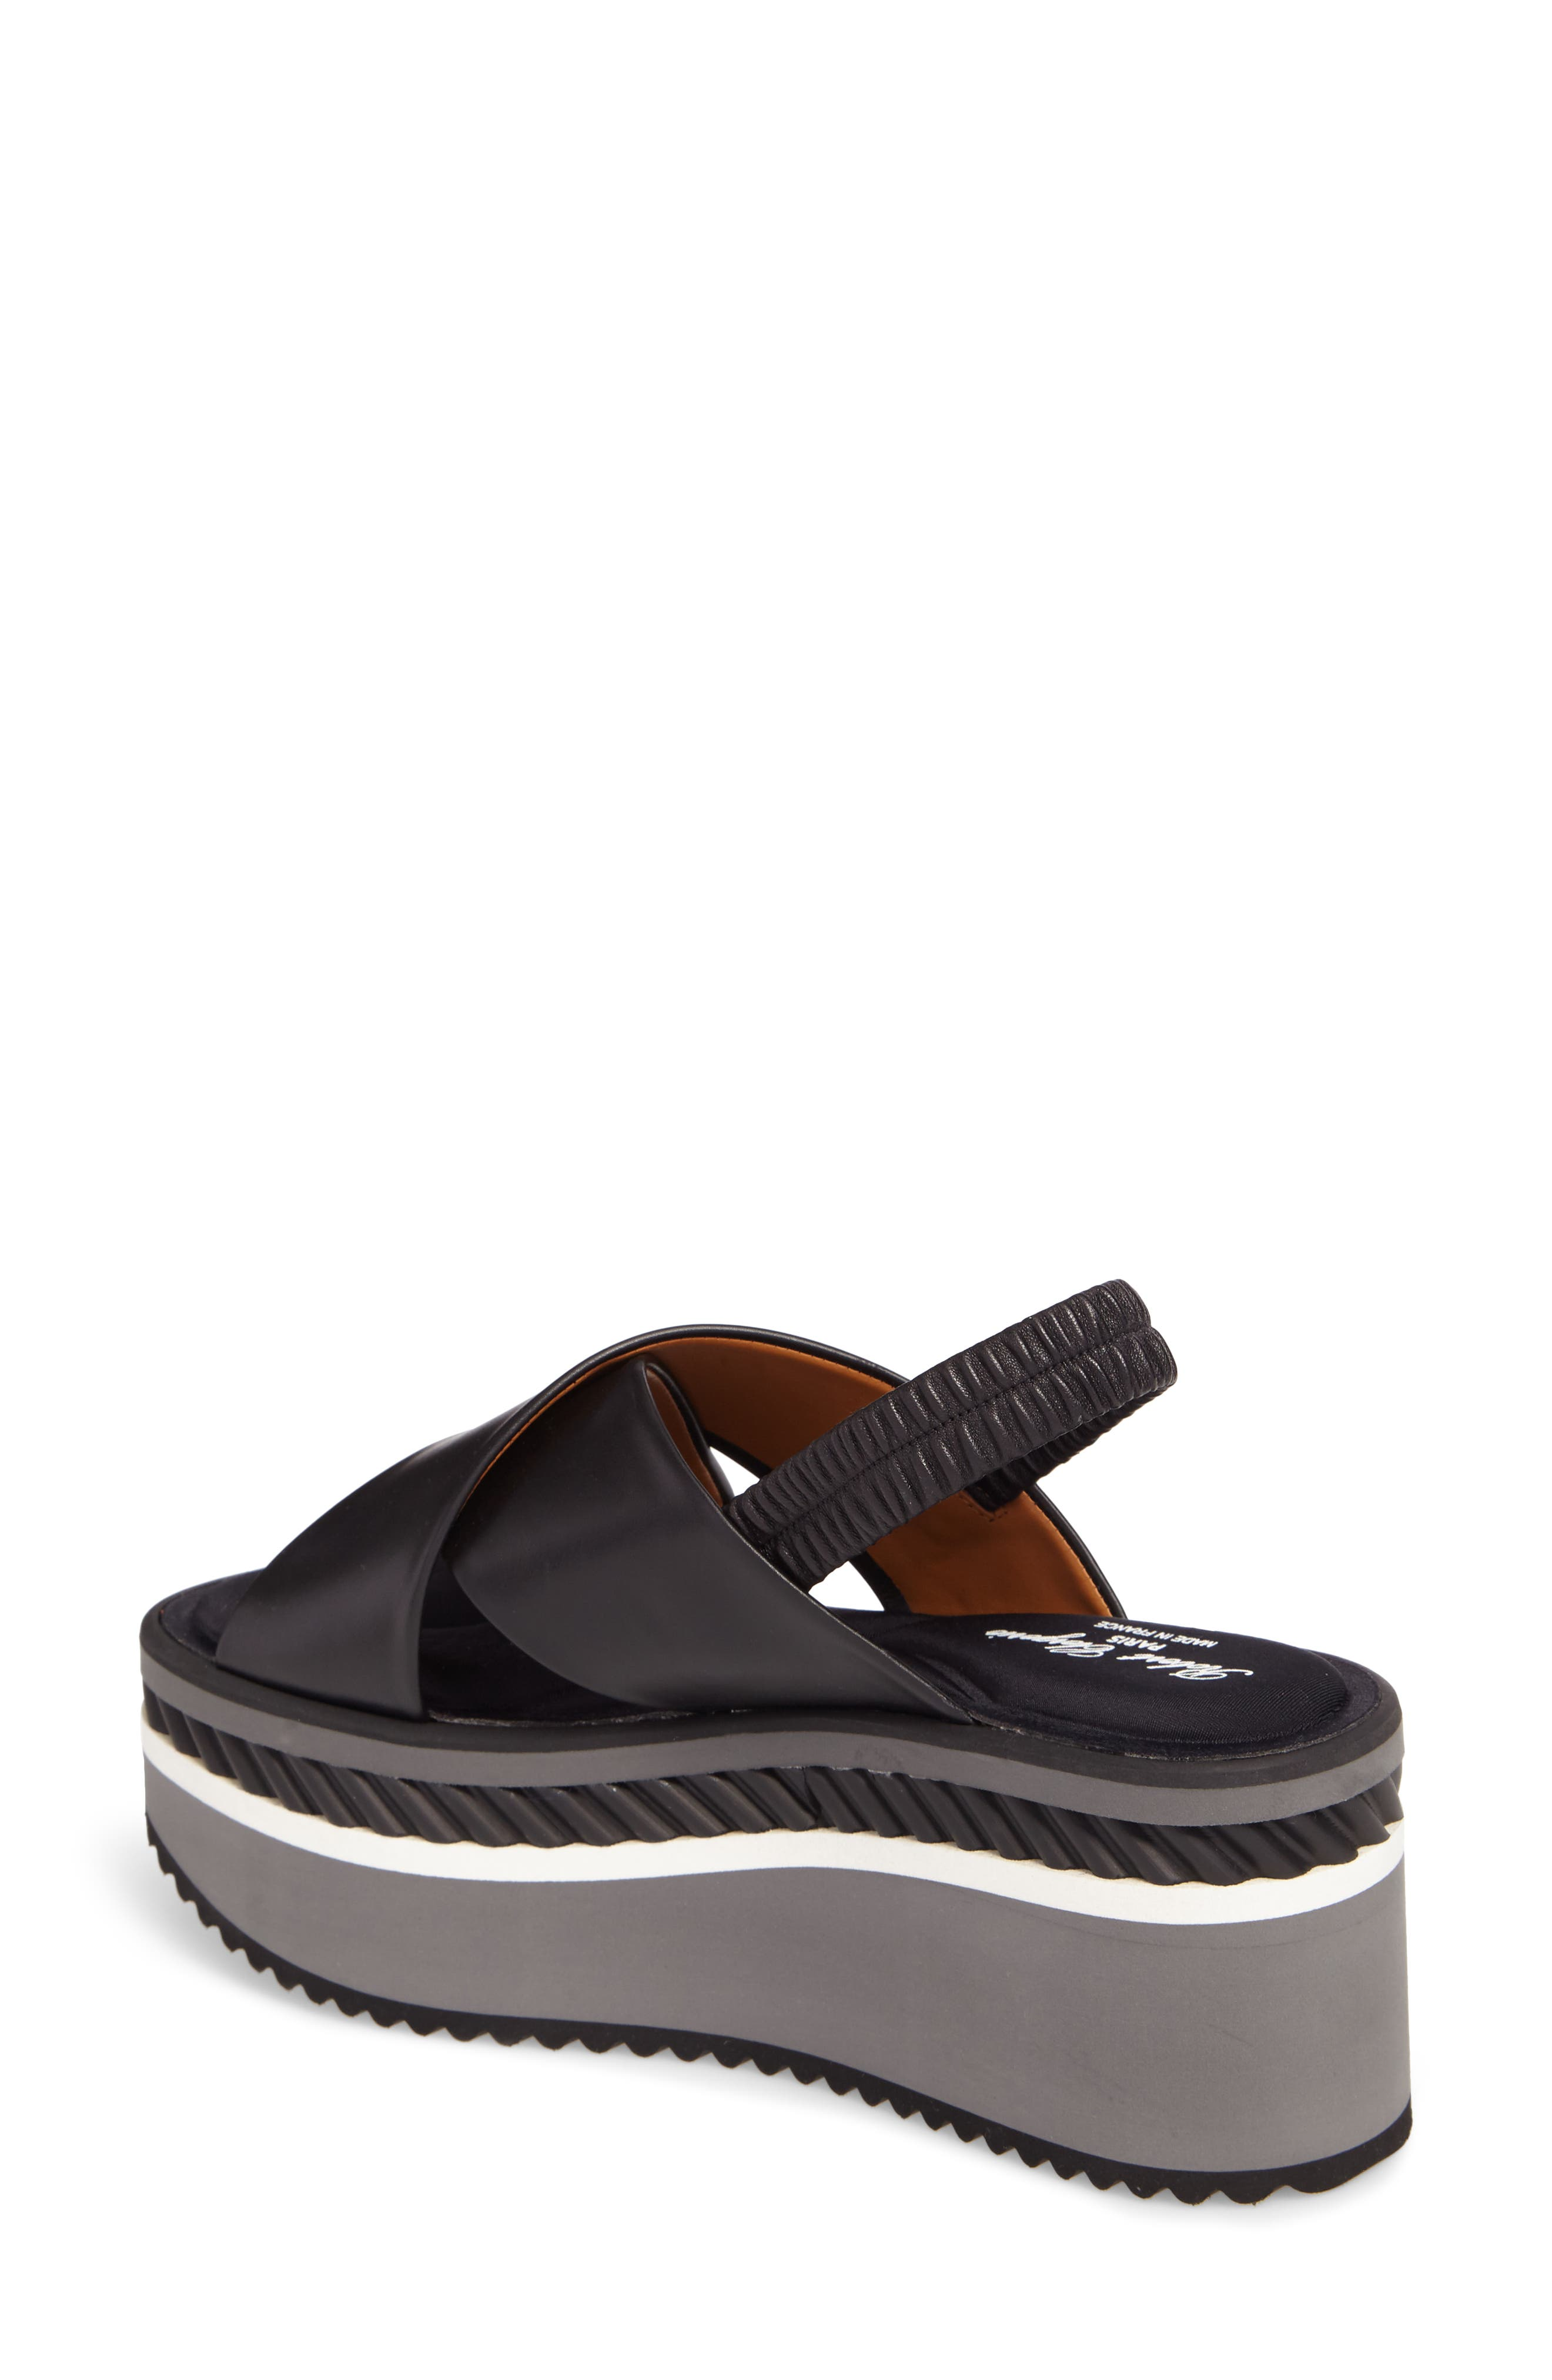 Omin Platform Slingback Sandal,                             Alternate thumbnail 2, color,                             Black